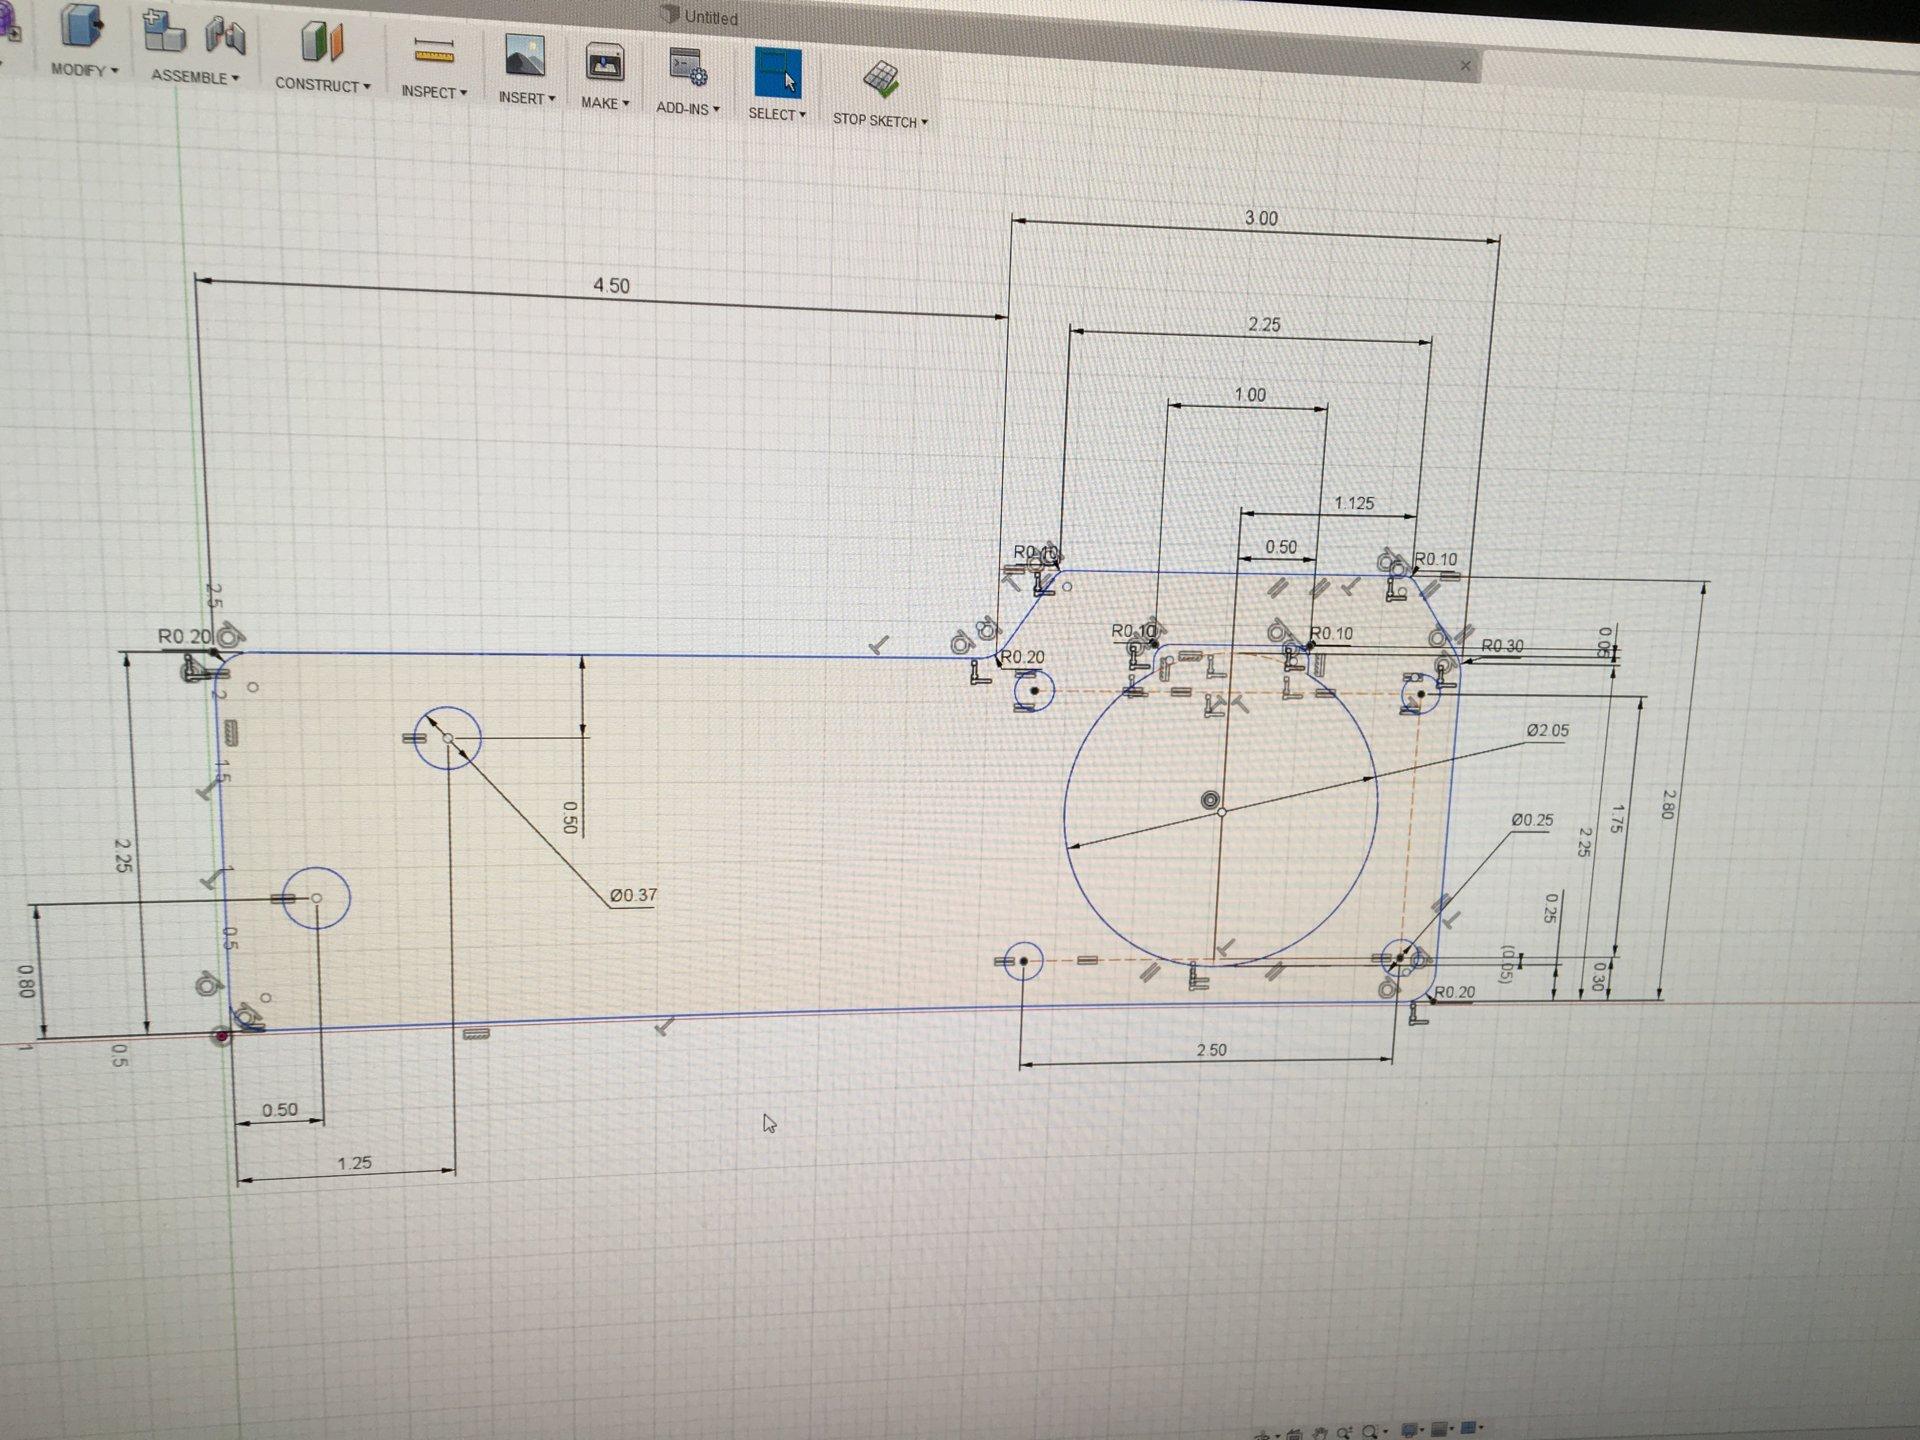 7 Way Trailer Wiring Harness DIY | IH8MUD Forum Valley Trailer Pin Wiring Diagram on